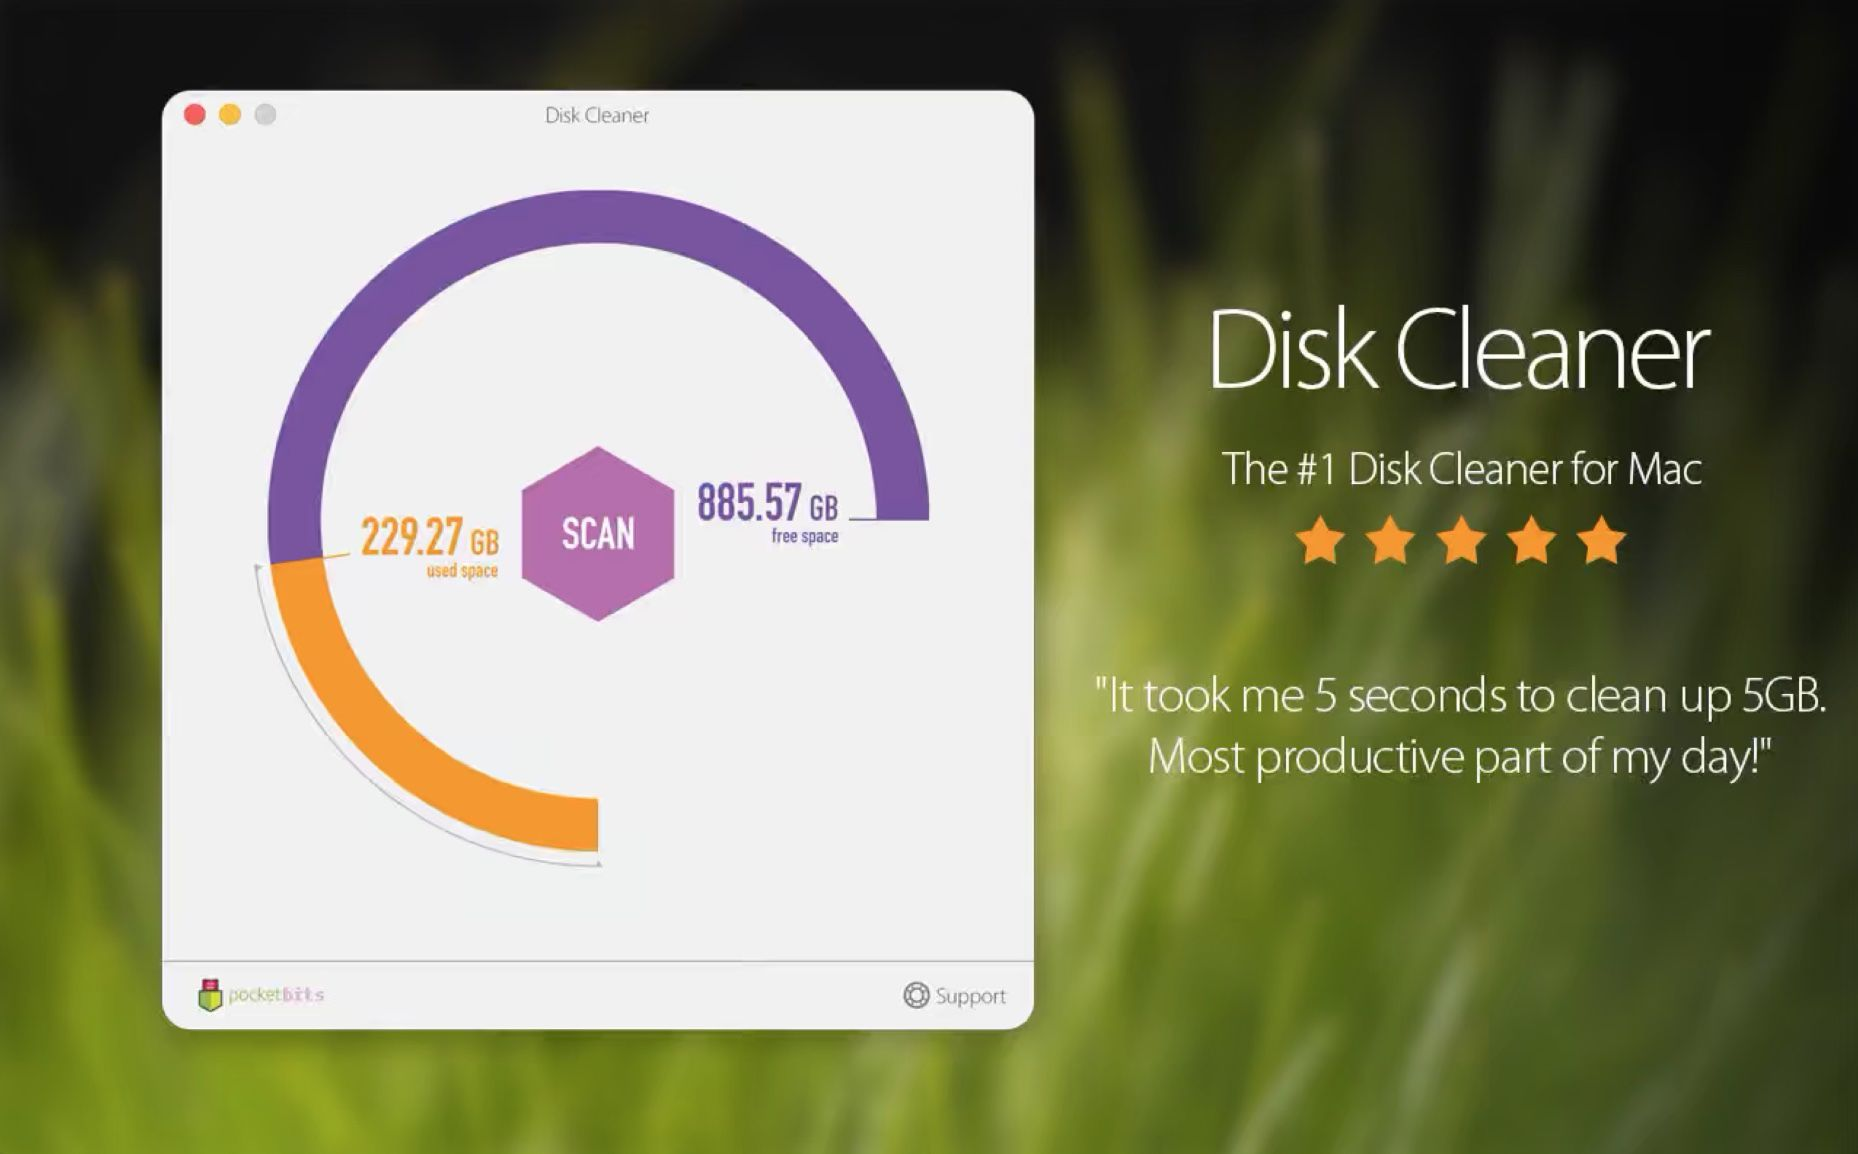 Disk Cleaner for macOS